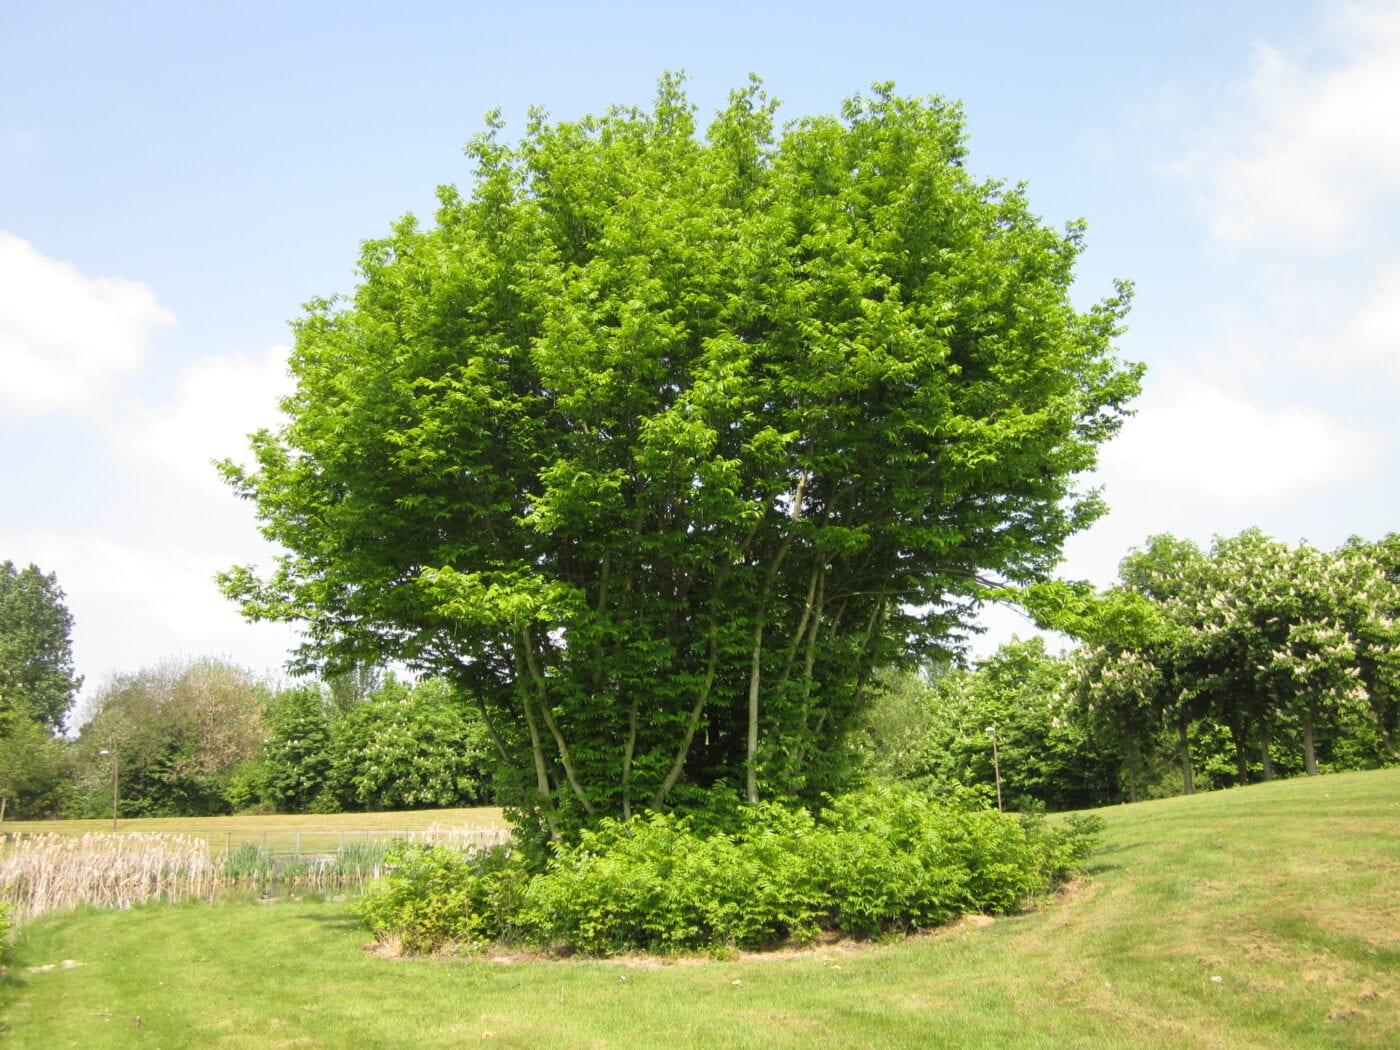 Caucasian Wingnut tree